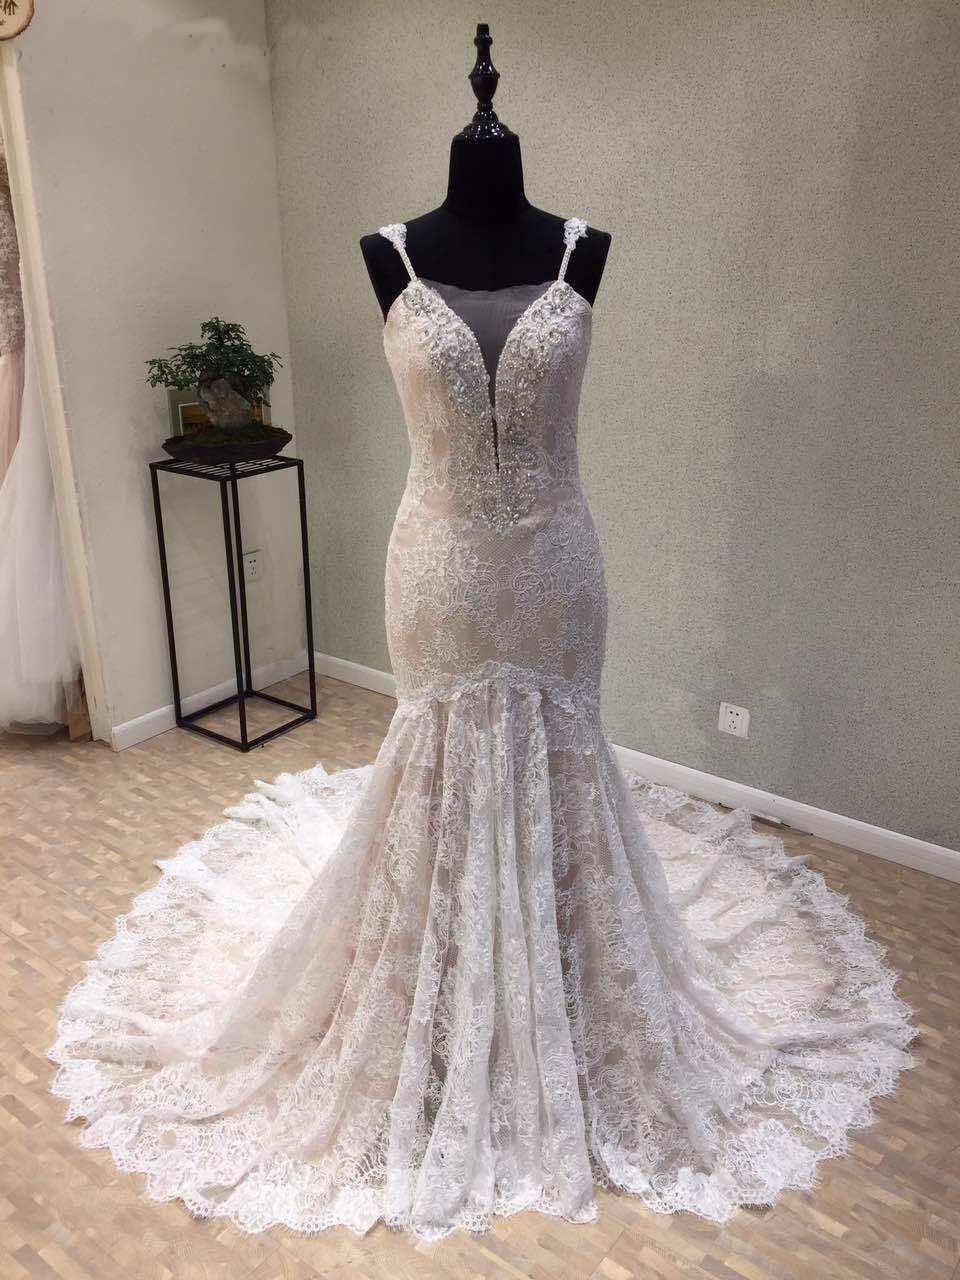 Fashion Lace Beading Mermaid Evening Prom Bridal Gown Wedding Dress